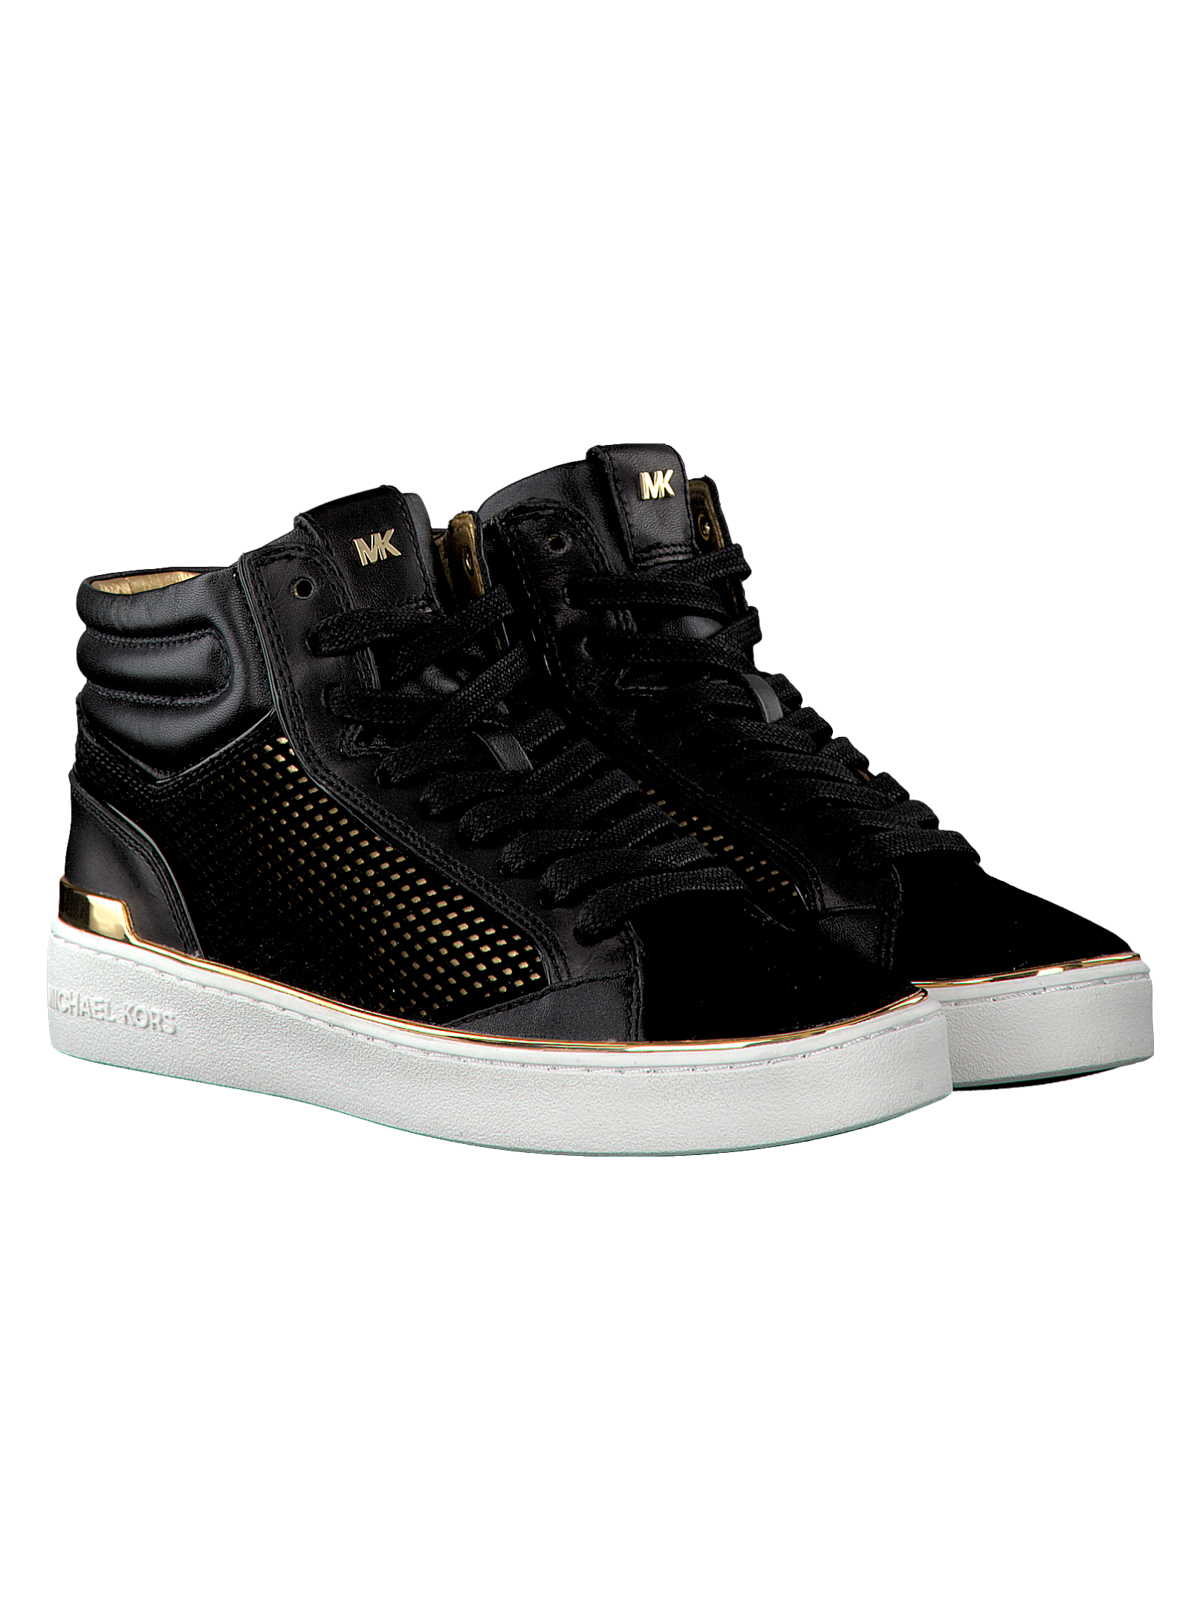 60c499d162242 Buy michael kors black high tops   OFF53% Discounted